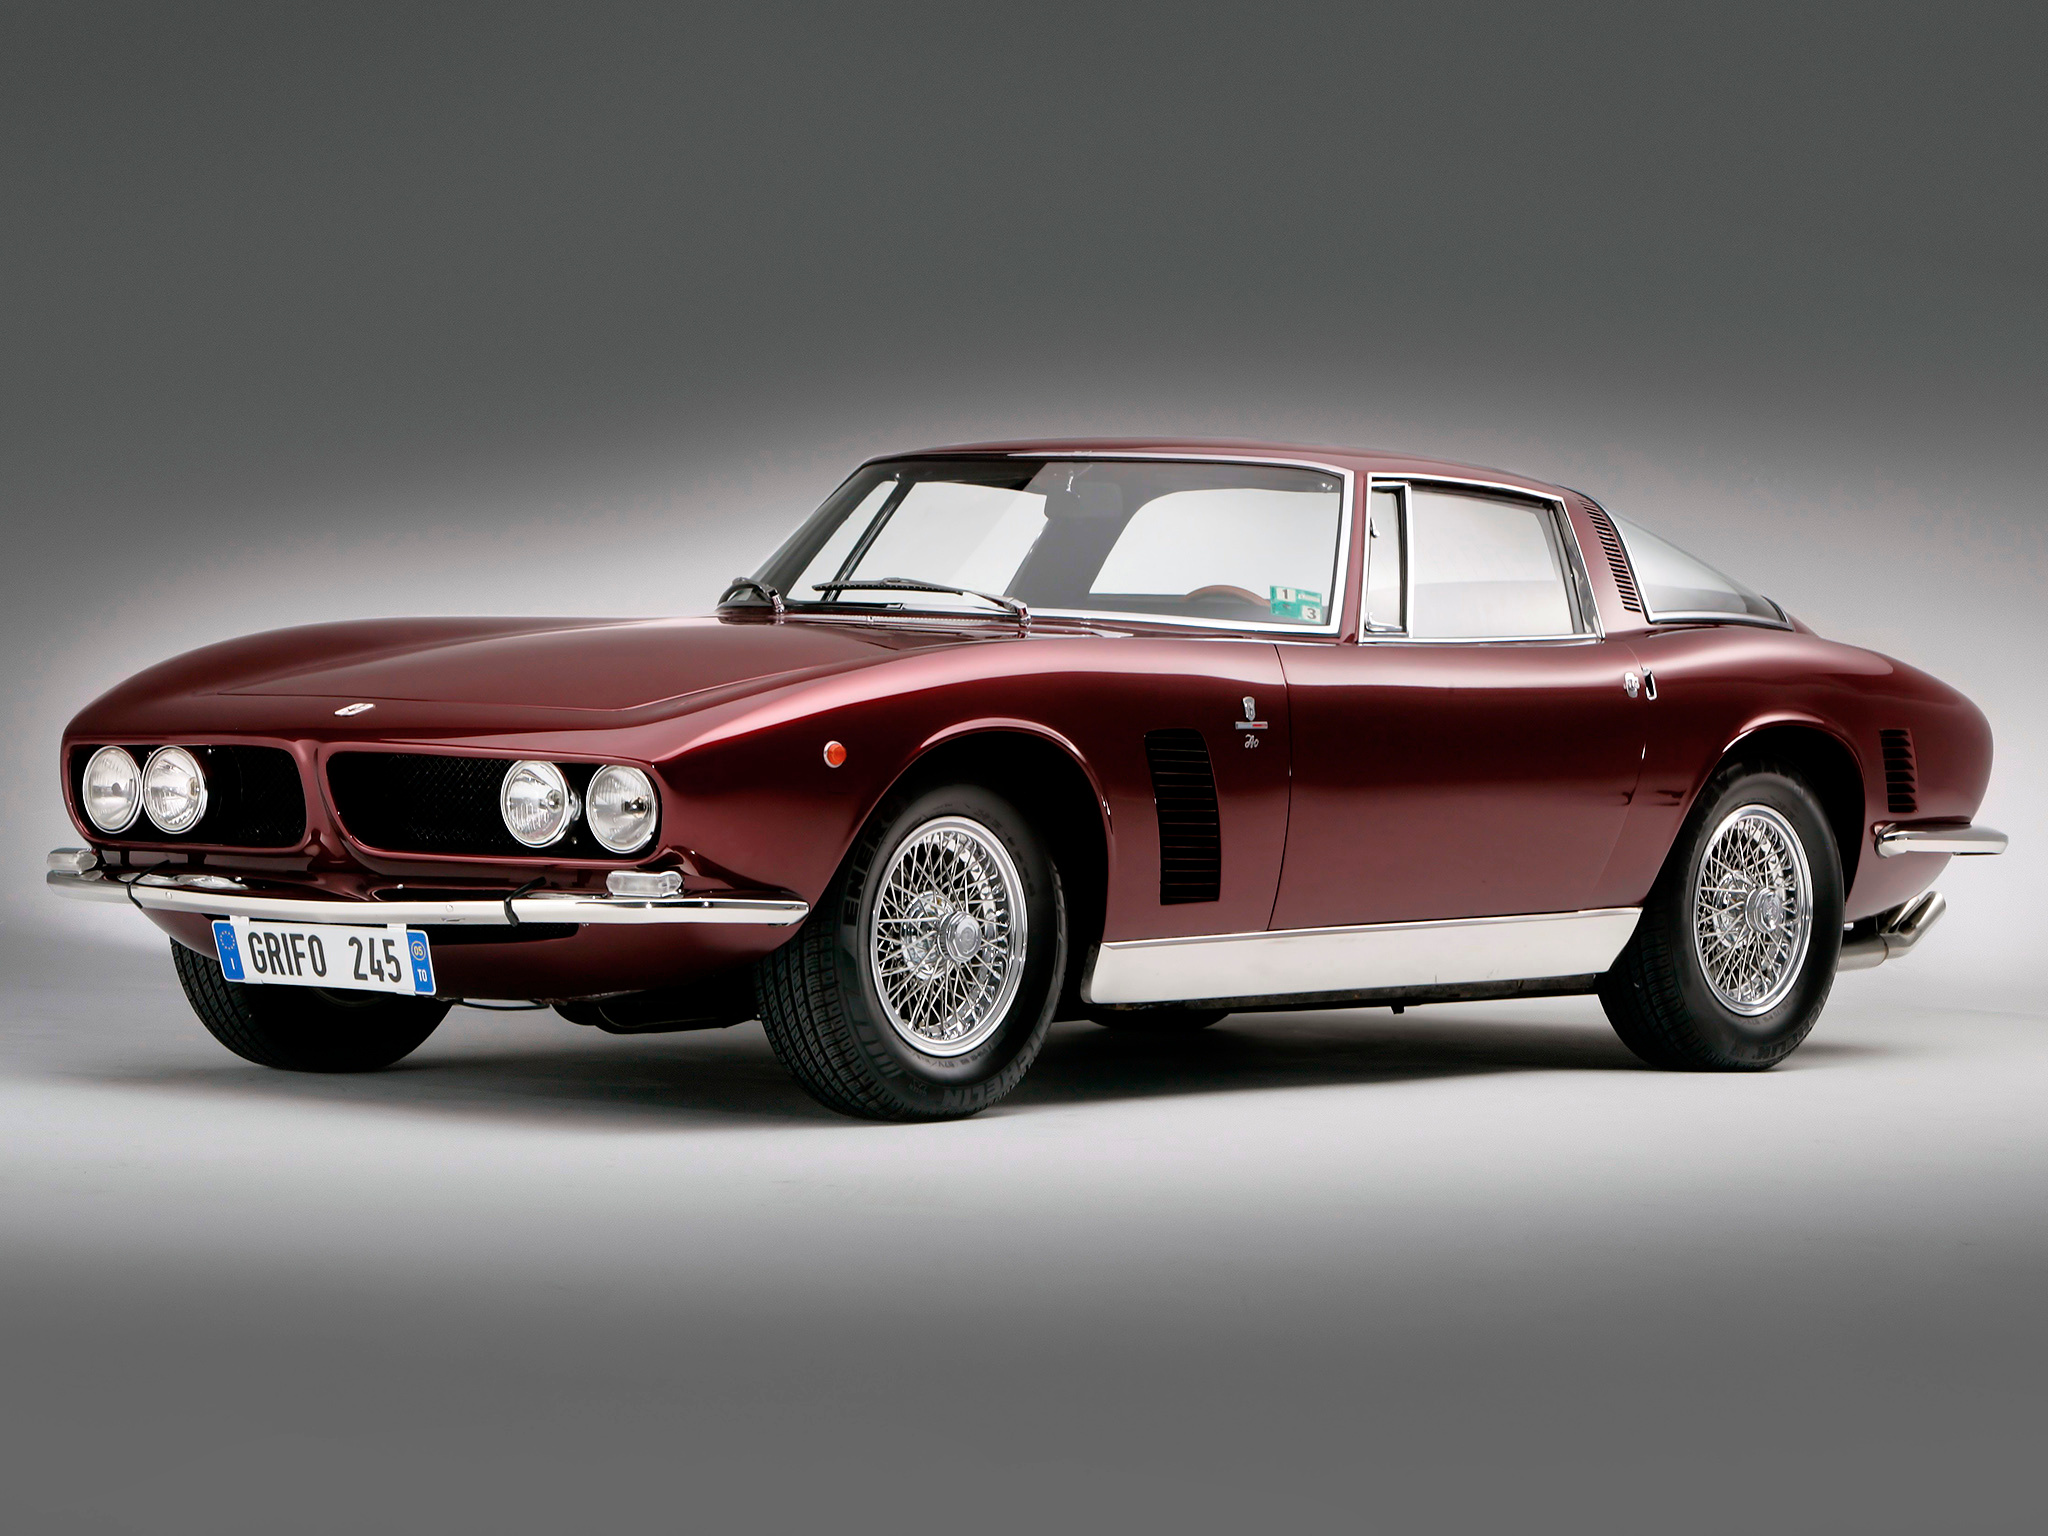 Car Colors 2017 >> 1965 Iso Grifo supercar classic wallpaper | 2048x1536 | 151163 | WallpaperUP